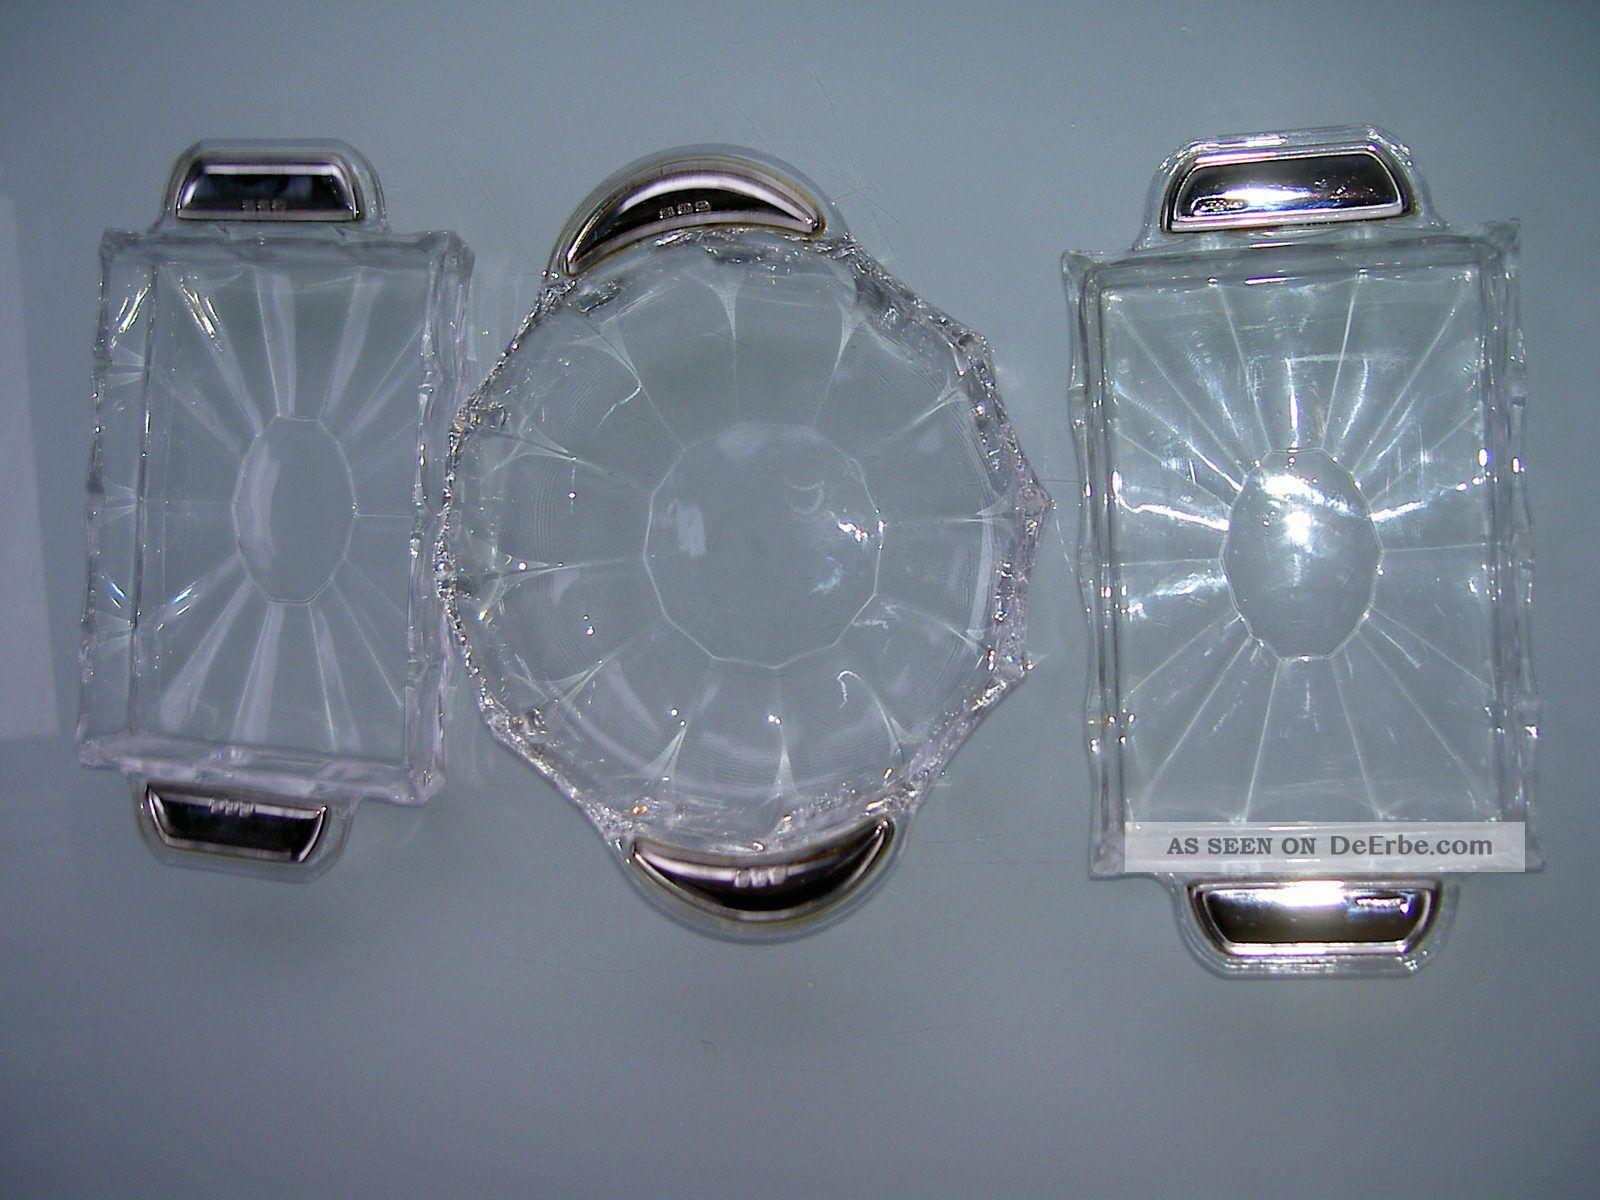 3 kristall anbietschalen mit 800er silbergriffe. Black Bedroom Furniture Sets. Home Design Ideas